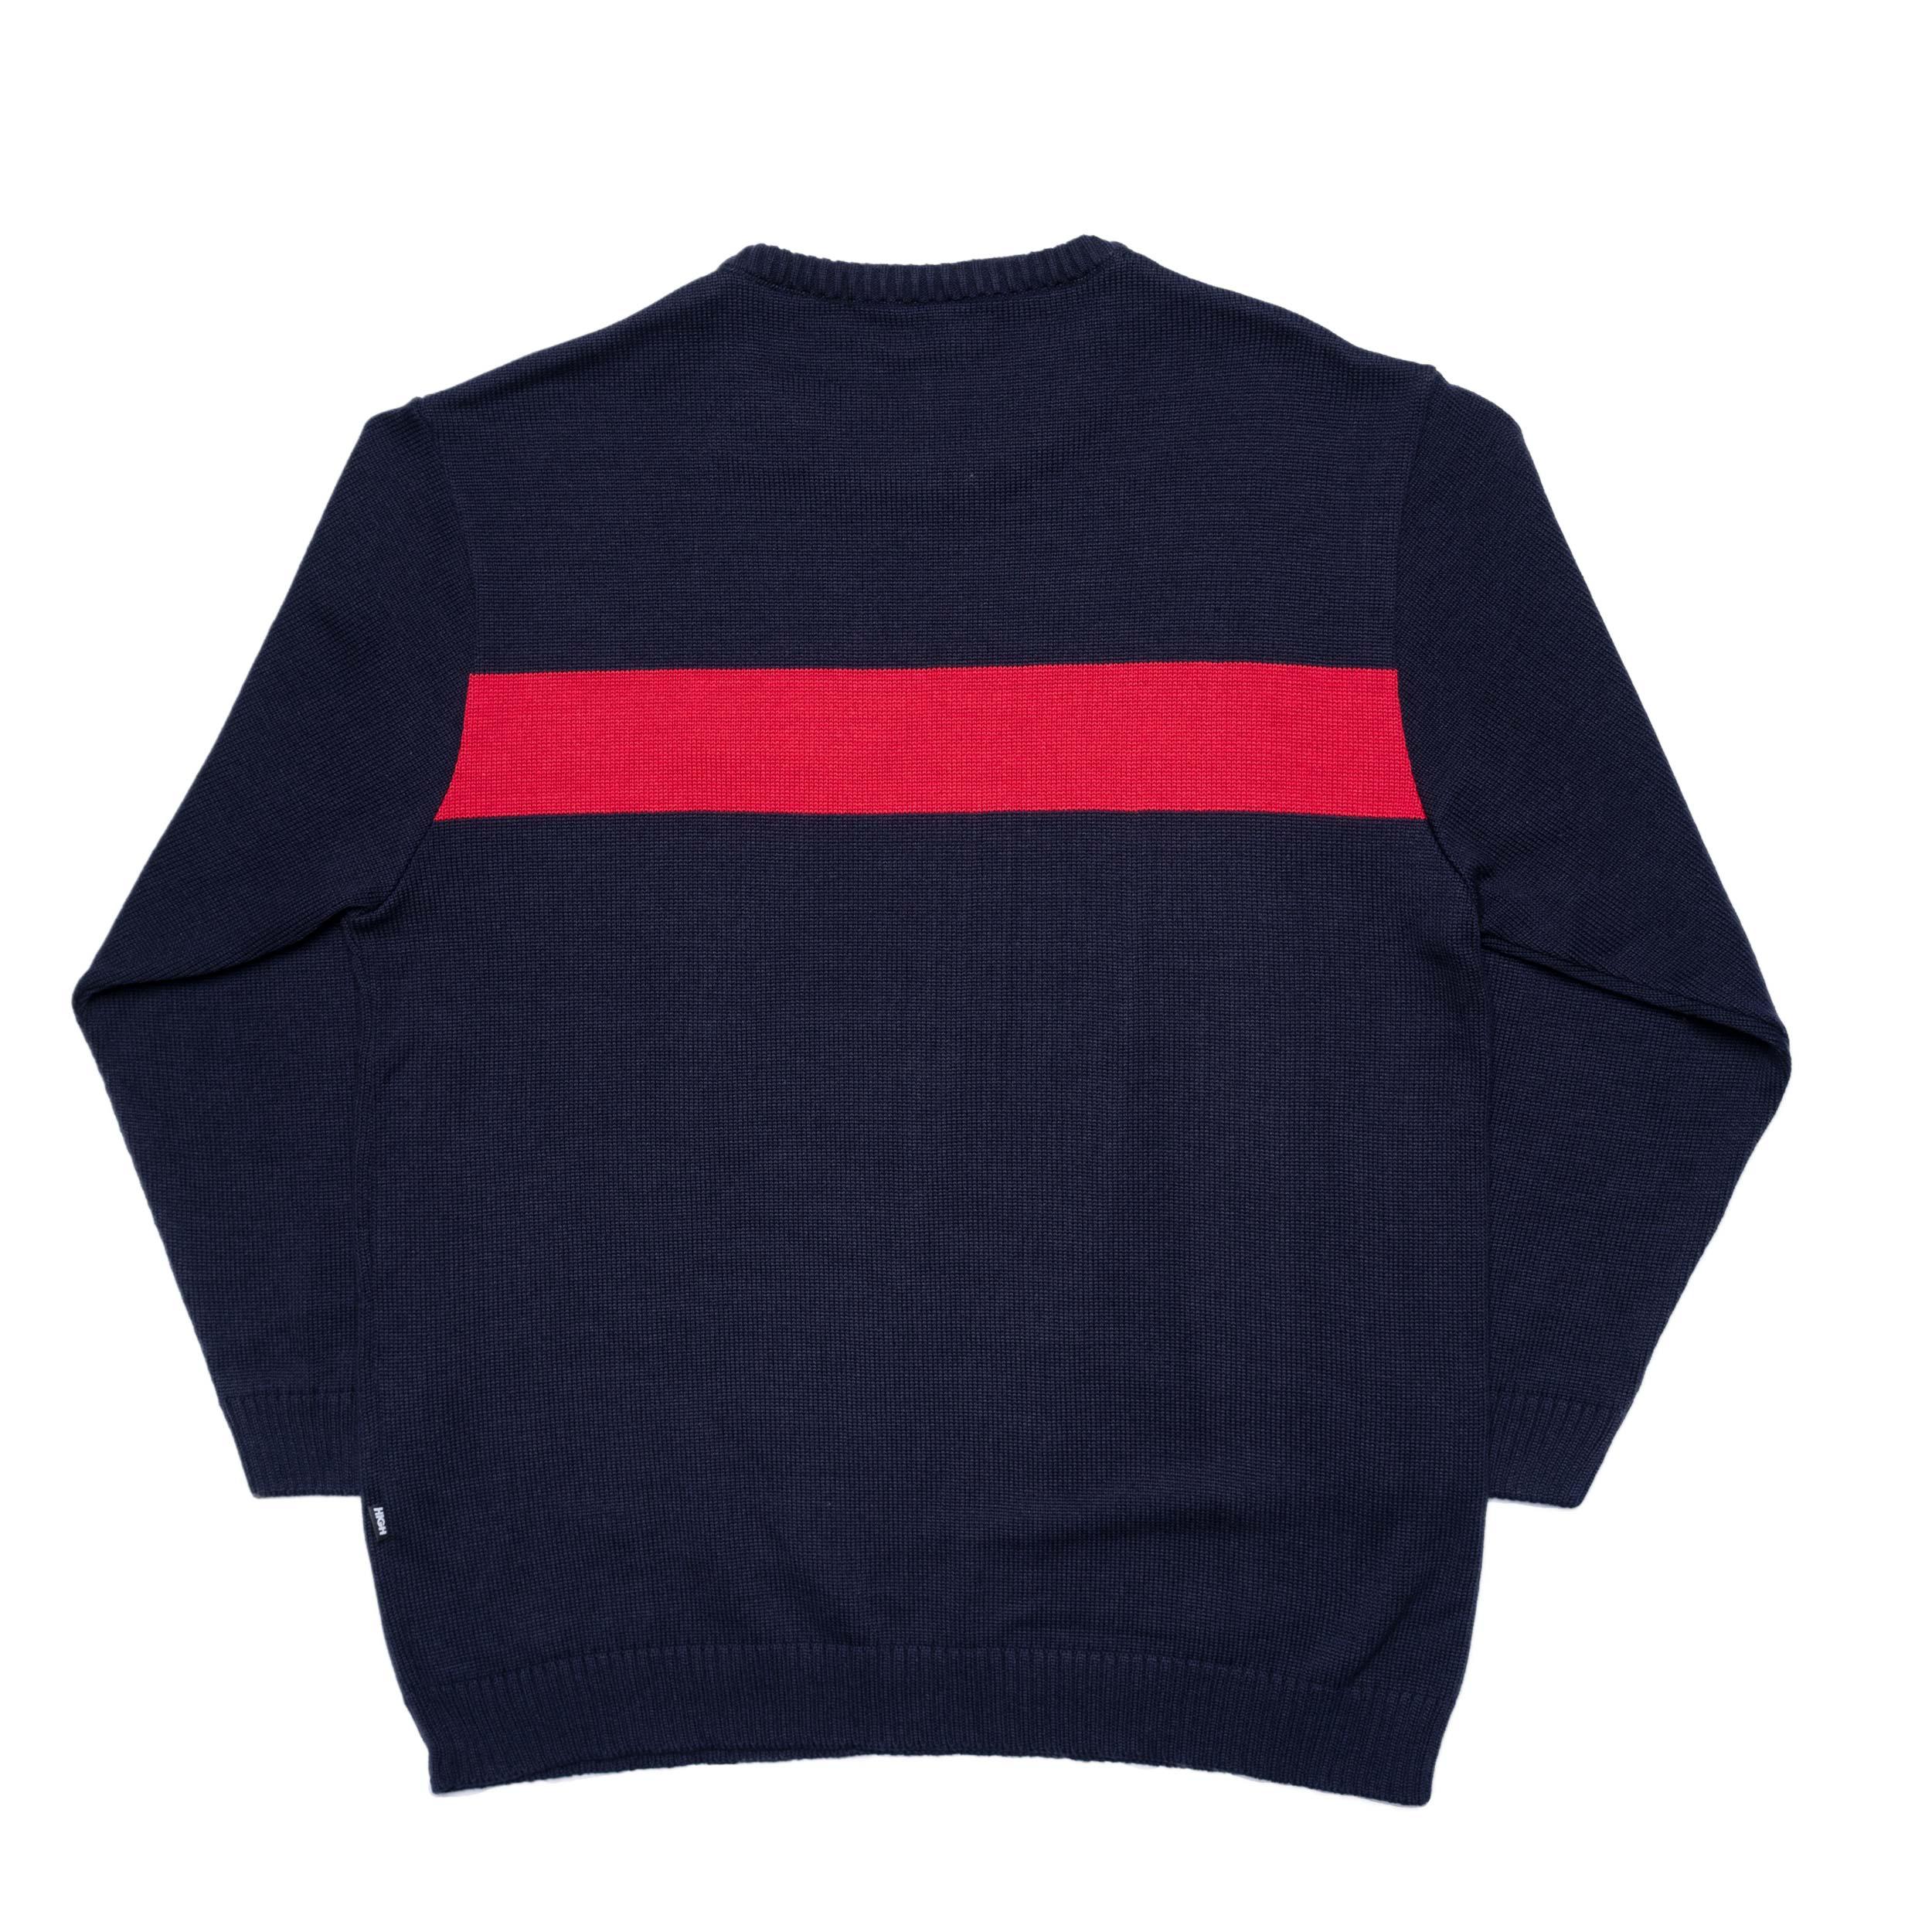 Knitwear_Navy_Red